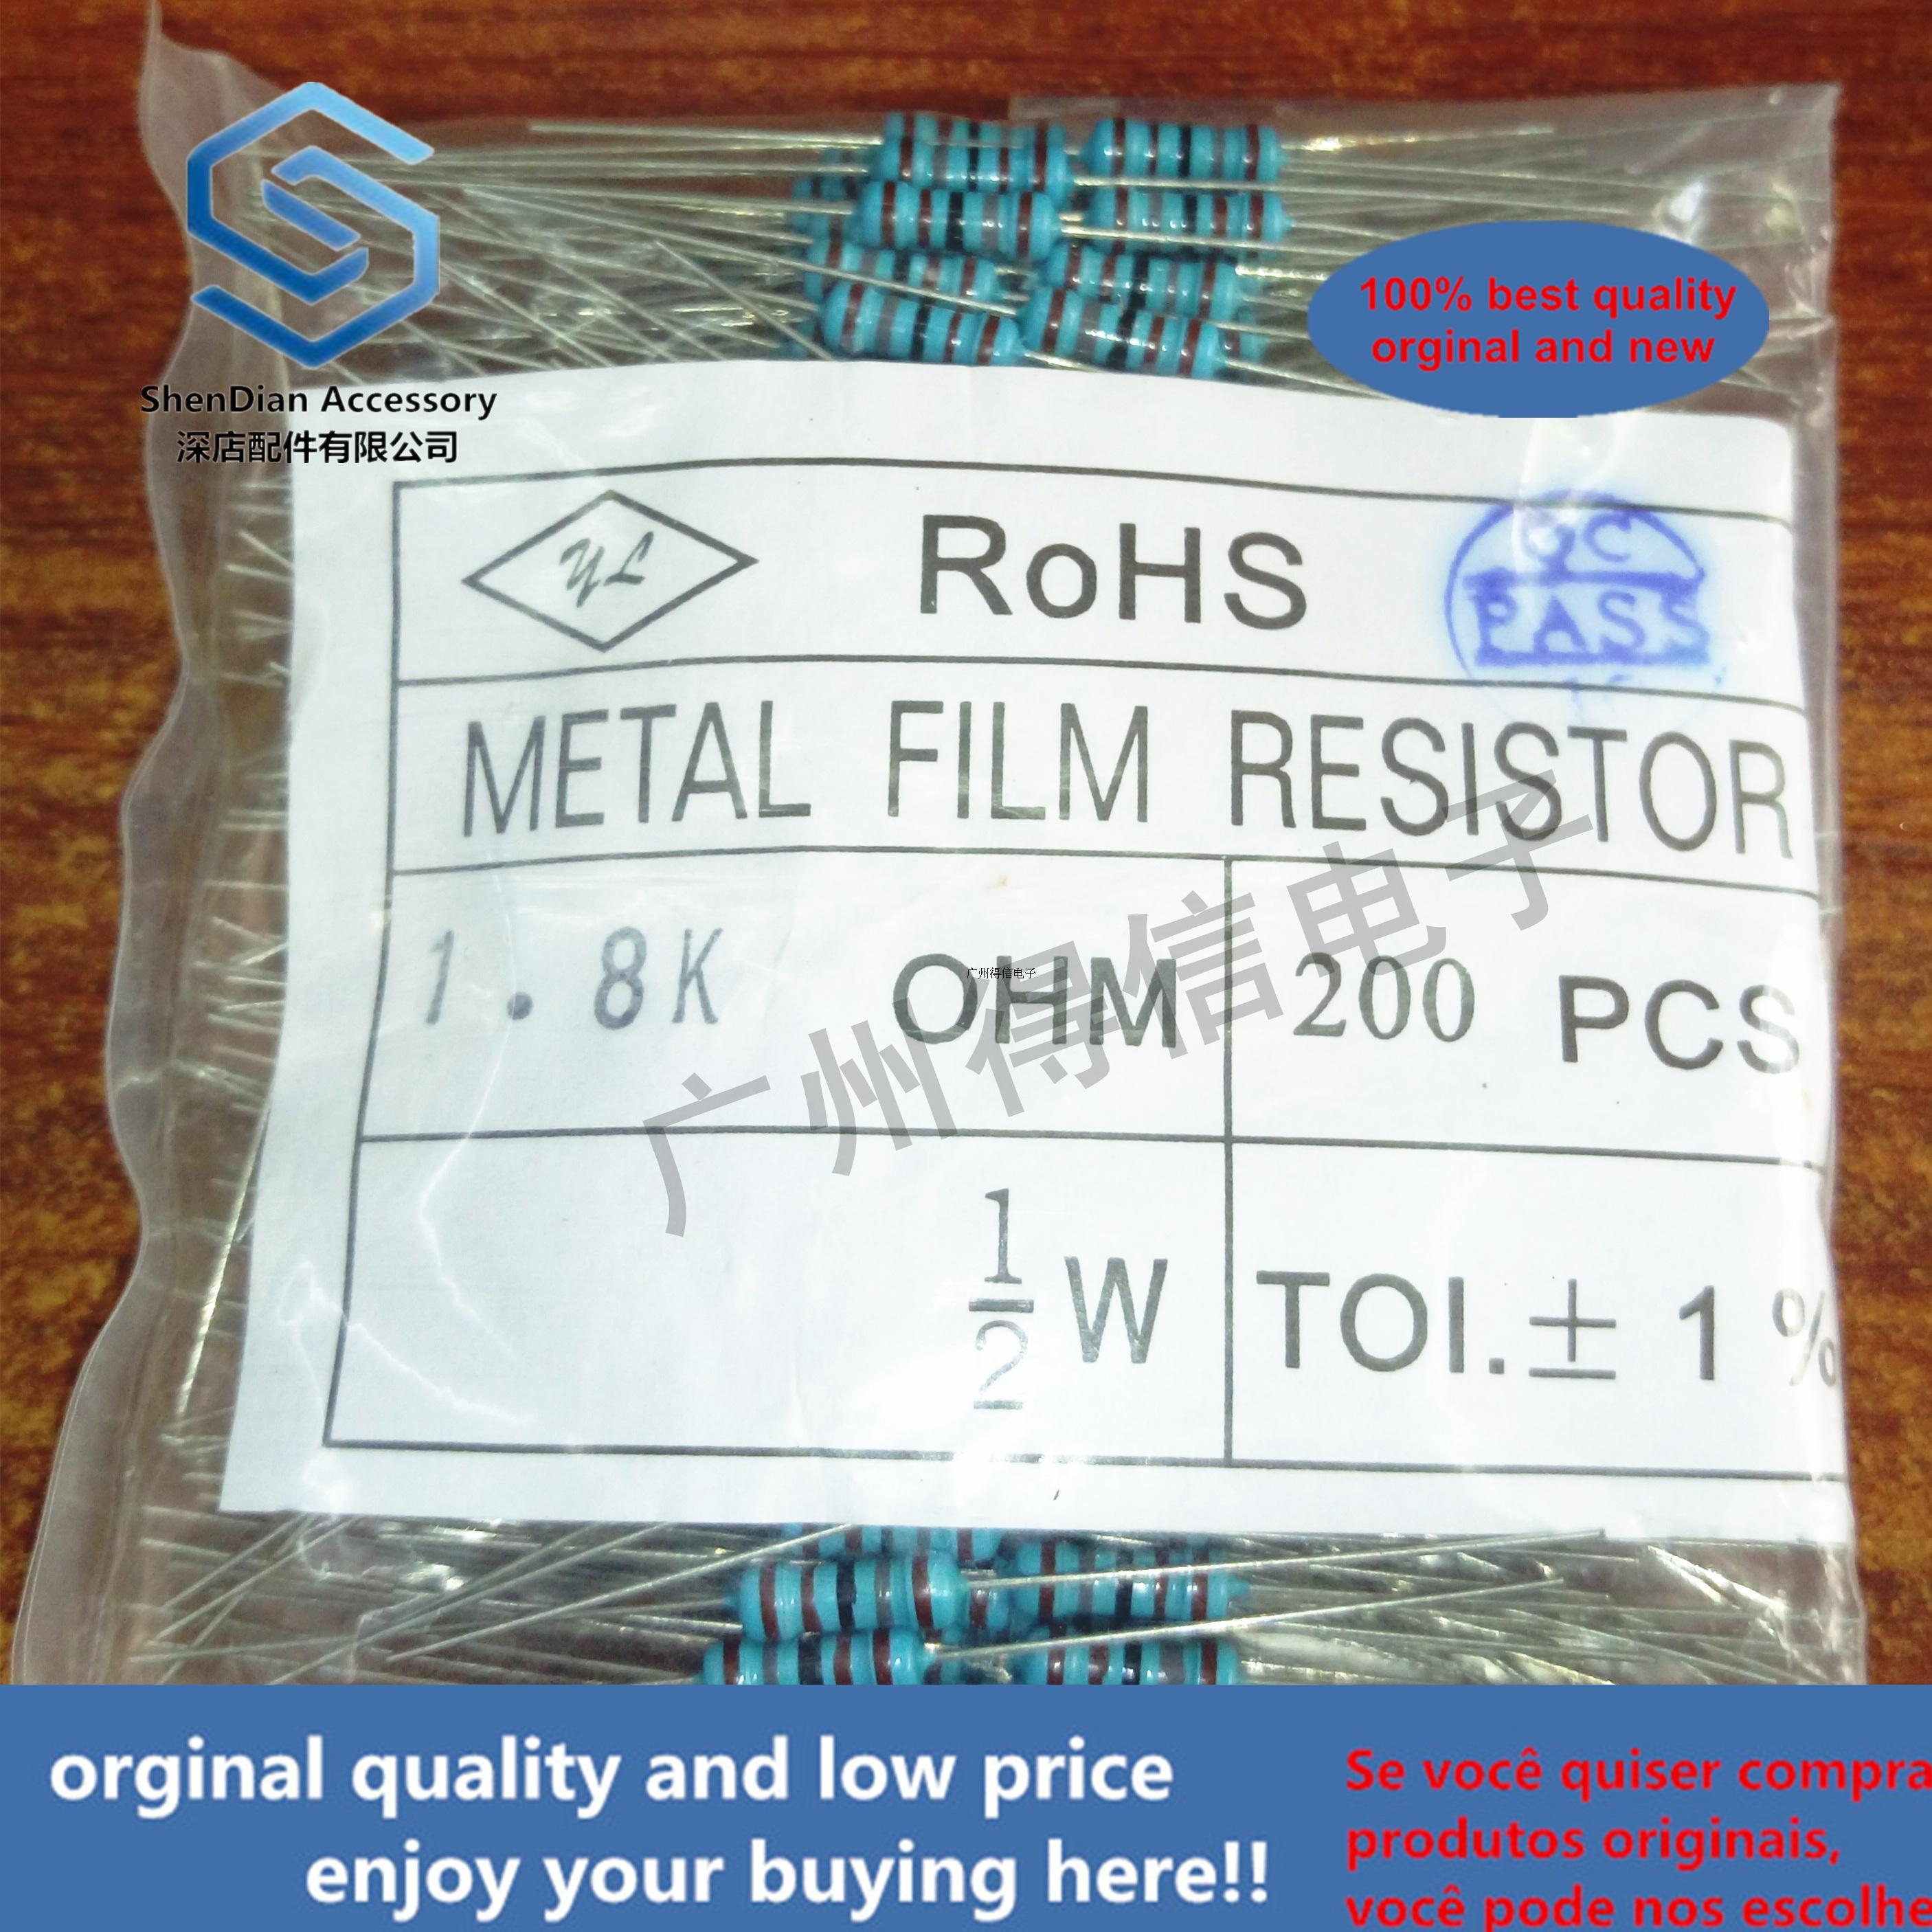 200pcs 1 / 2W 16R 16Euro 1% Brand New Metal Film Iron Feet Resistance Bag 200pcs Per Pack